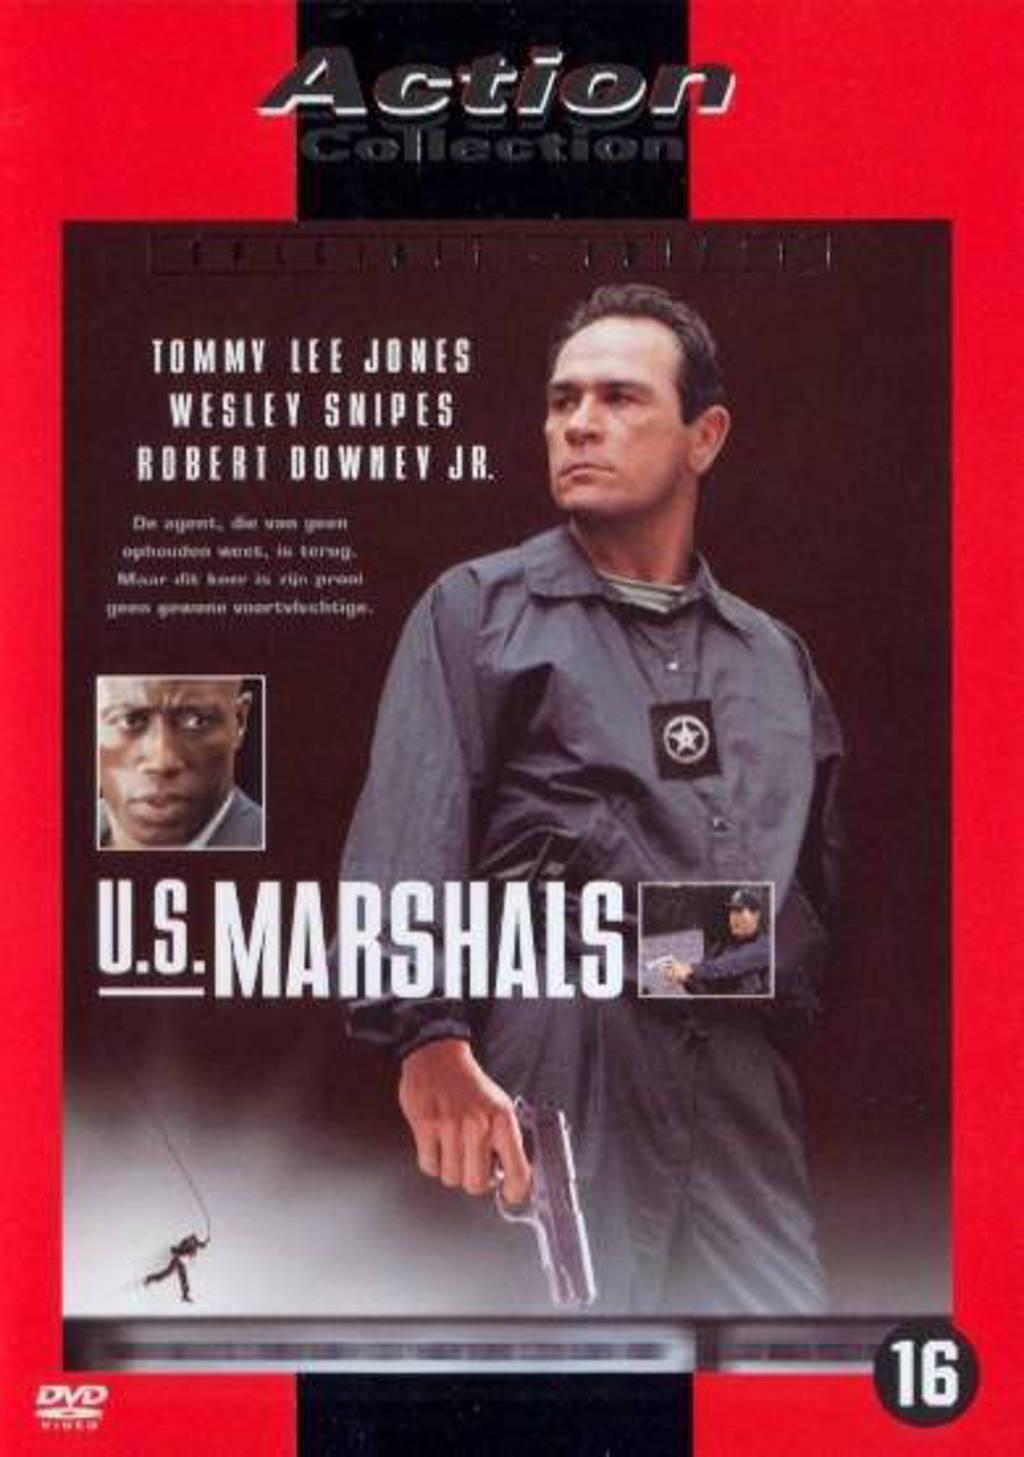 U.S. marshals (DVD)